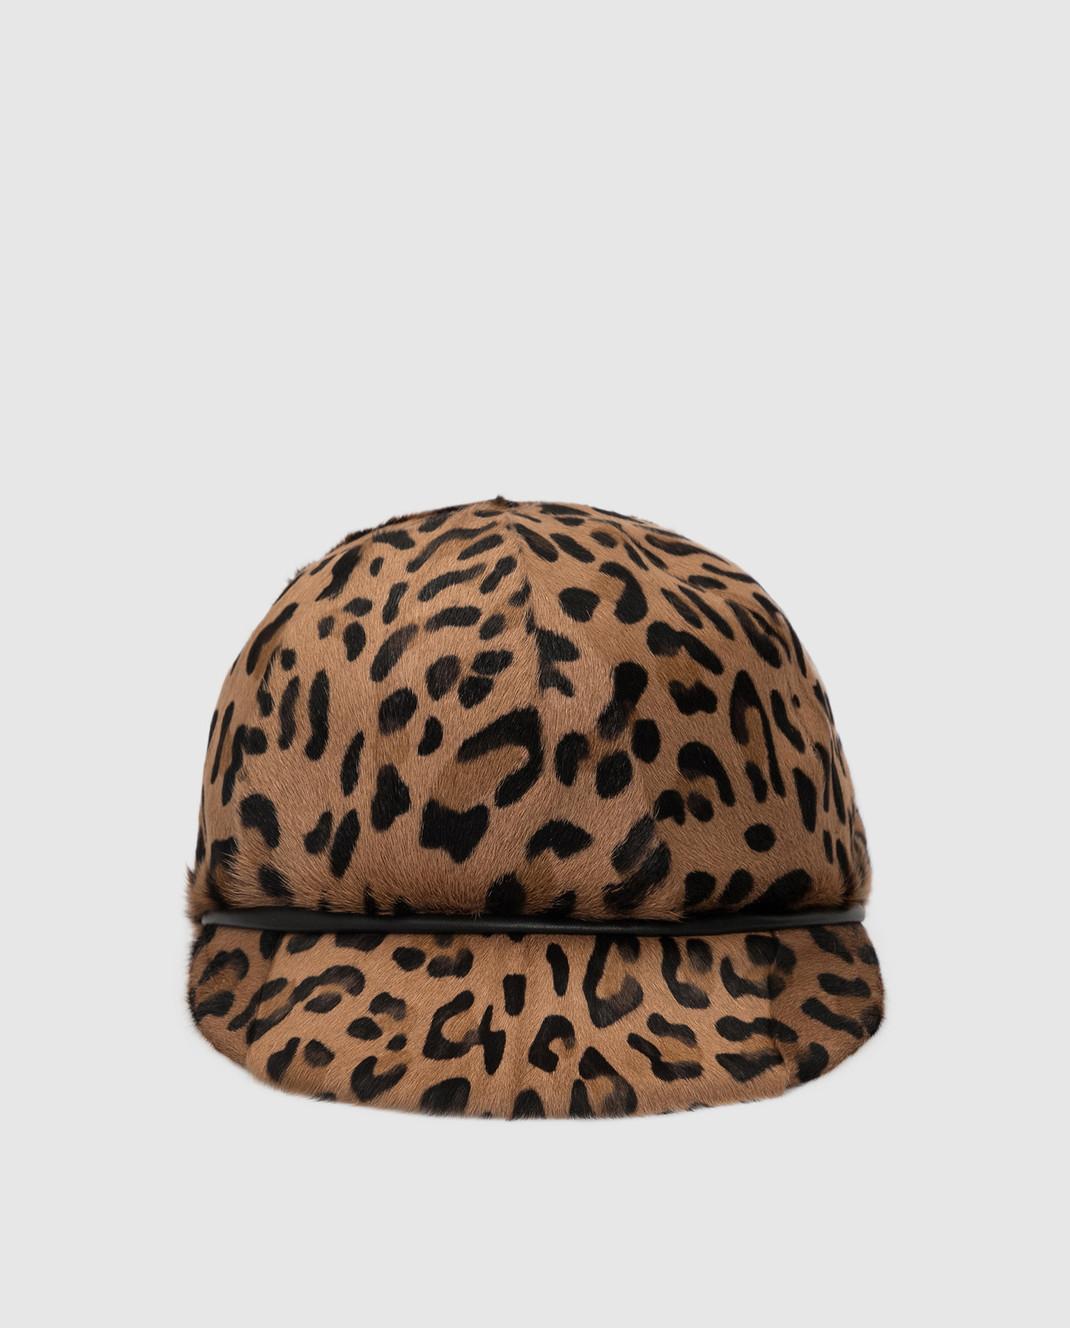 Simonetta Ravizza Бежевая шляпа изображение 1